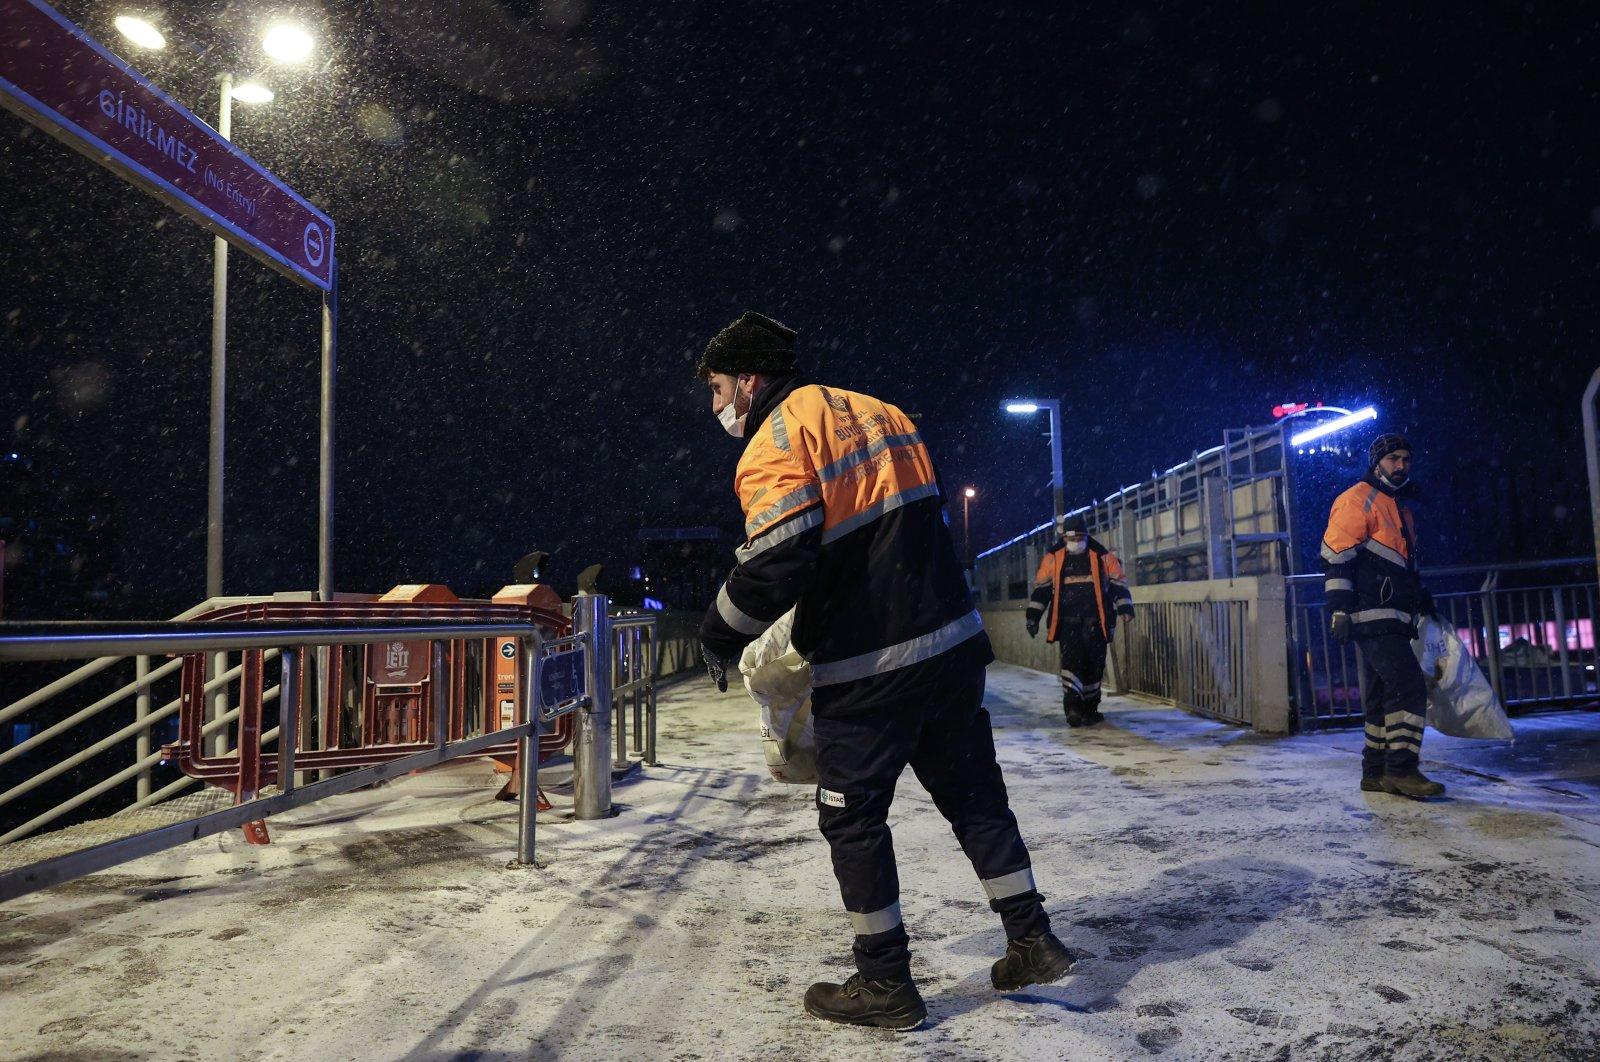 Municipality crews throw salt on overpasses during snowfall at the Cevizlibağ metrobus station in Istanbul, Turkey, Feb. 14, 2021. (AA Photo)